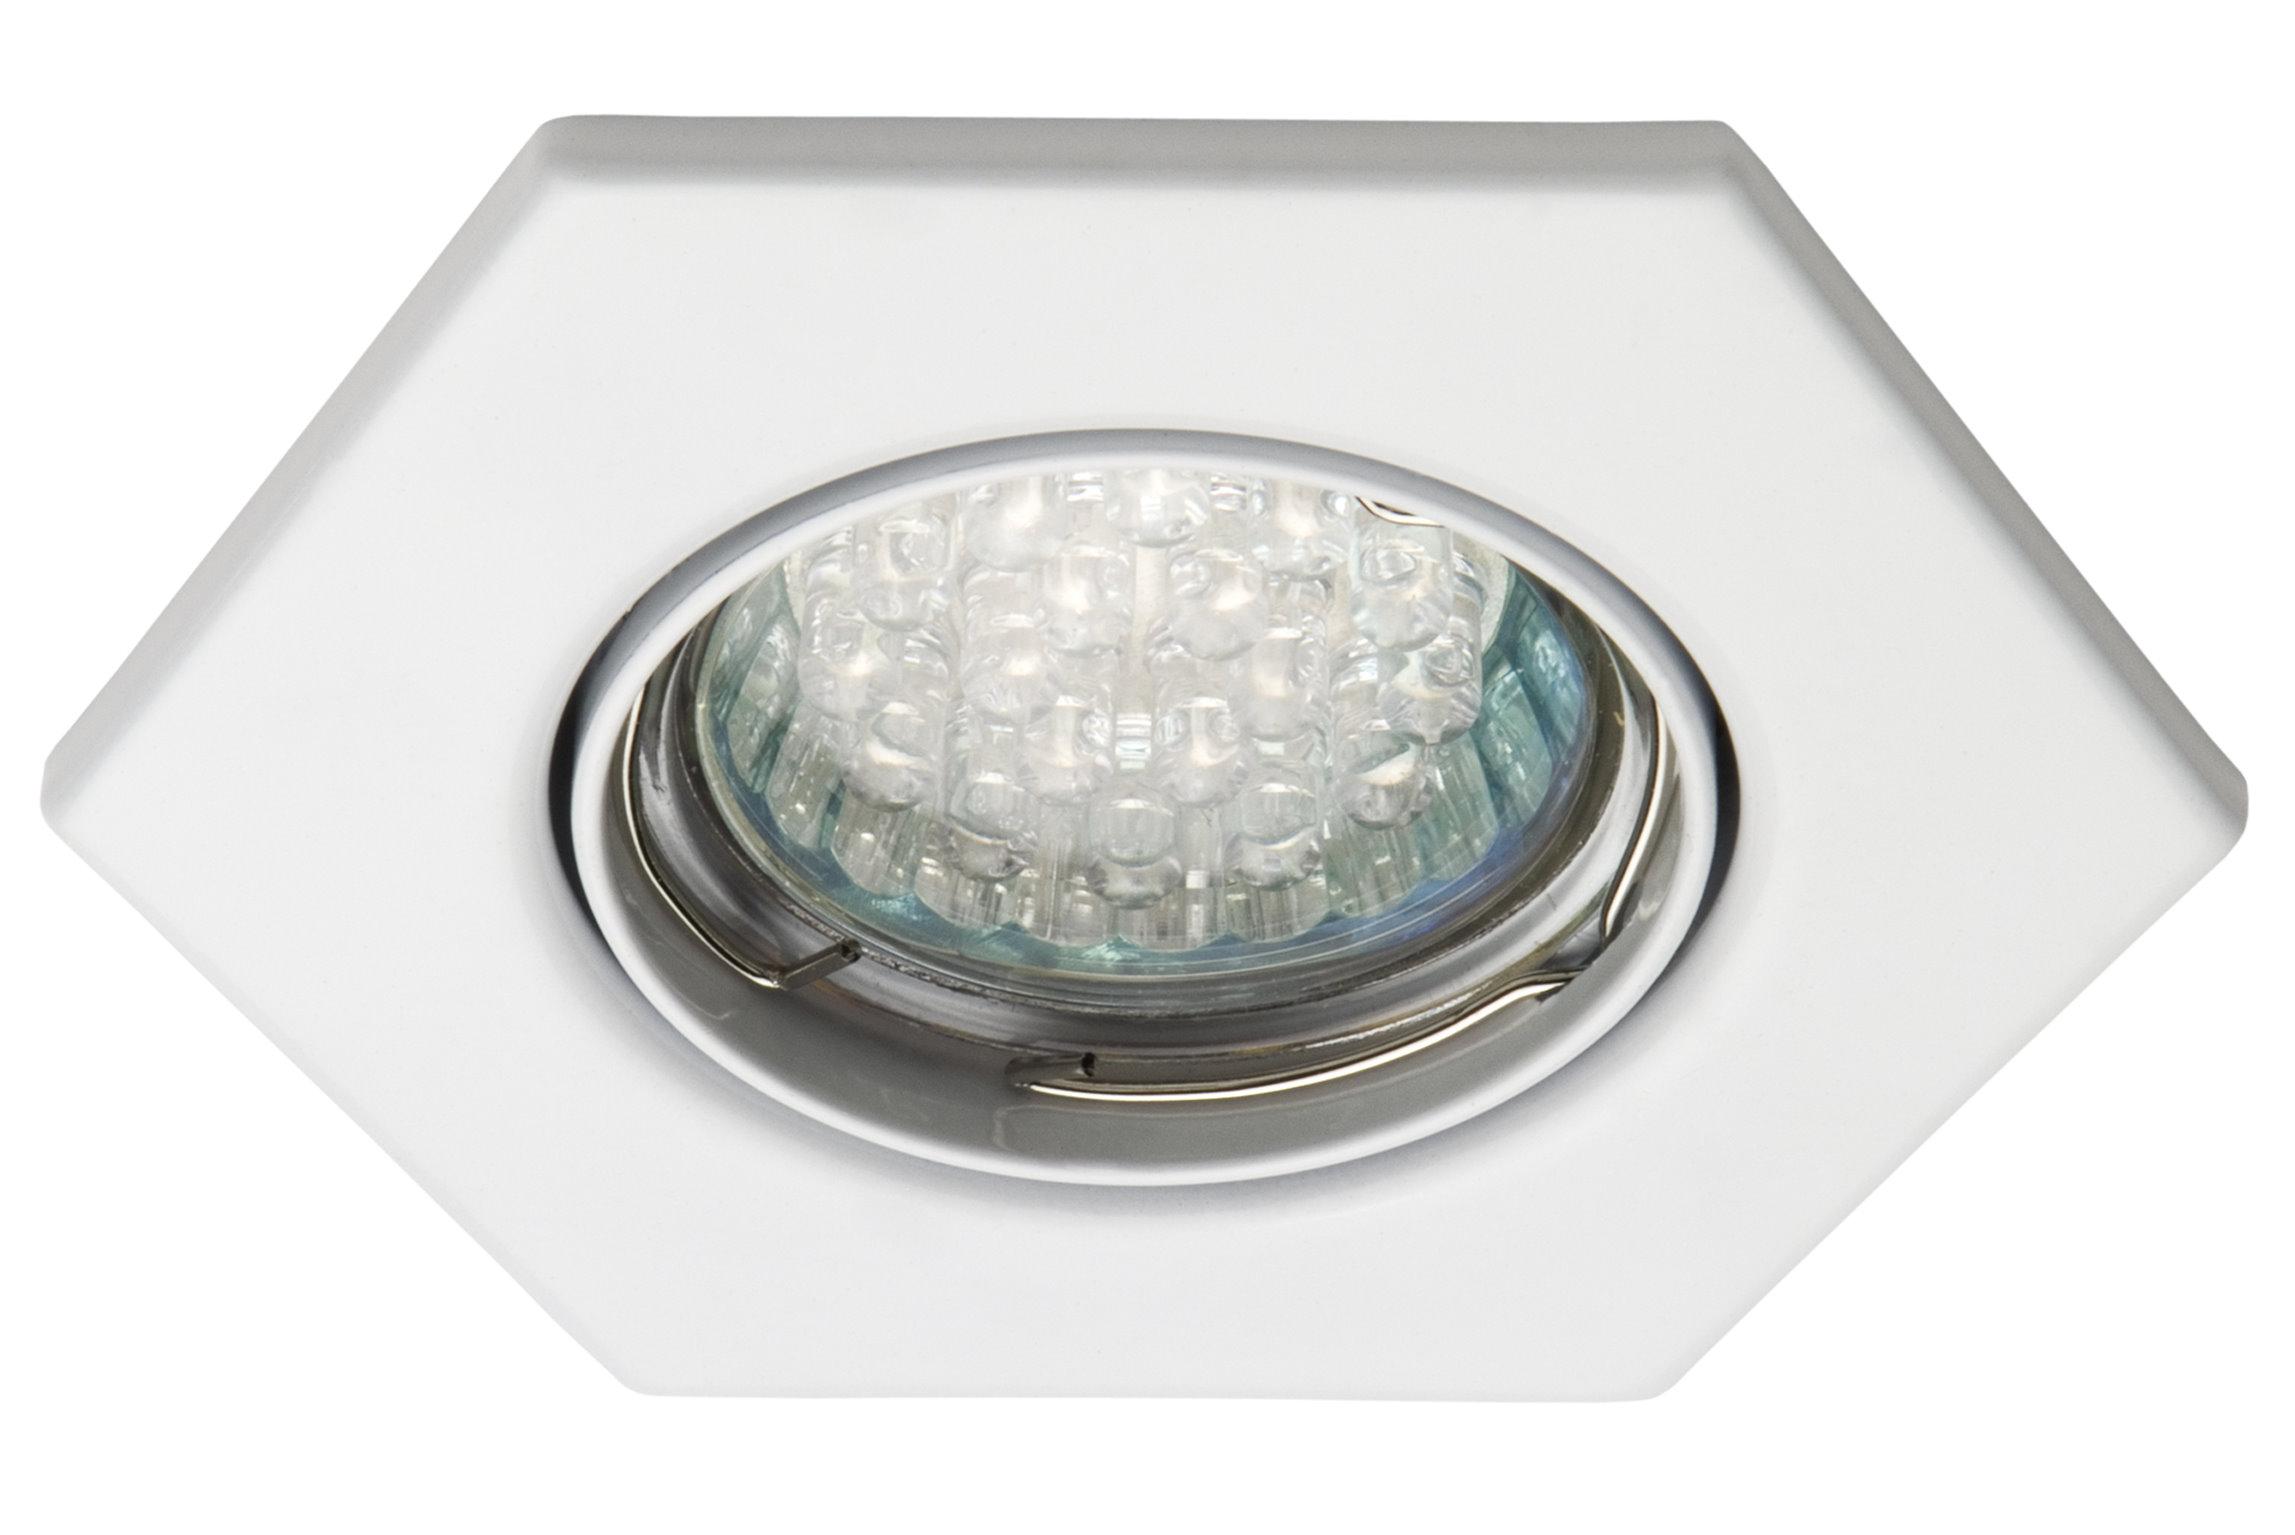 12v led set einbaustrahler deckenleuchten led lampen spot einbauspots ebay. Black Bedroom Furniture Sets. Home Design Ideas